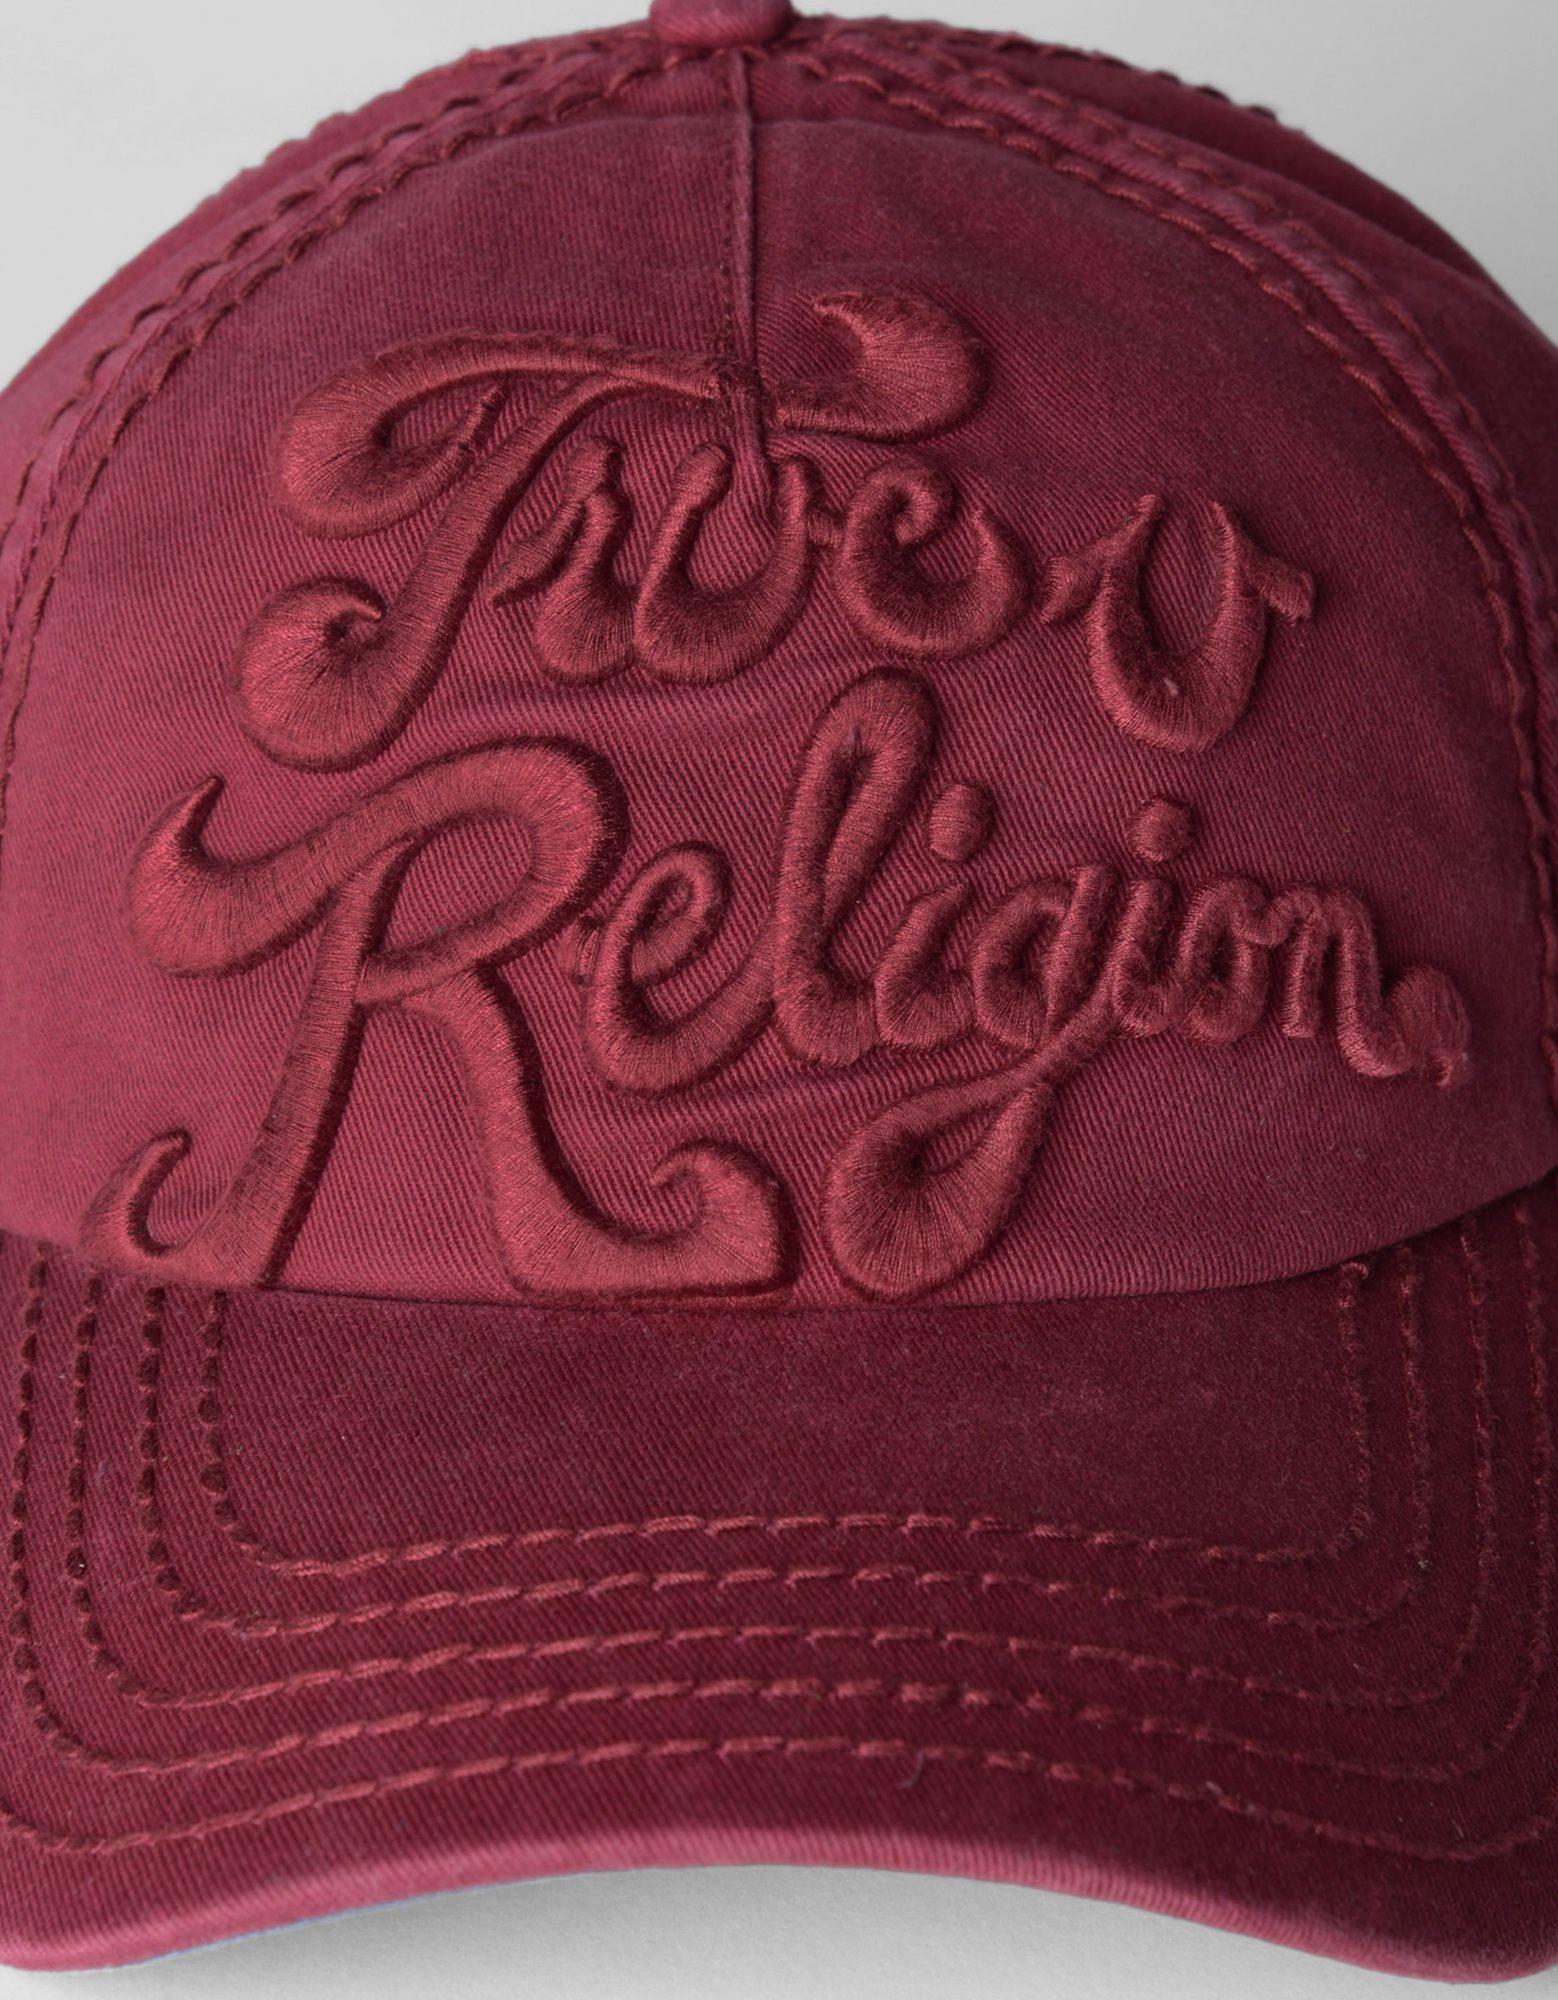 true religion tonal 3d logo baseball cap in red for men lyst. Black Bedroom Furniture Sets. Home Design Ideas